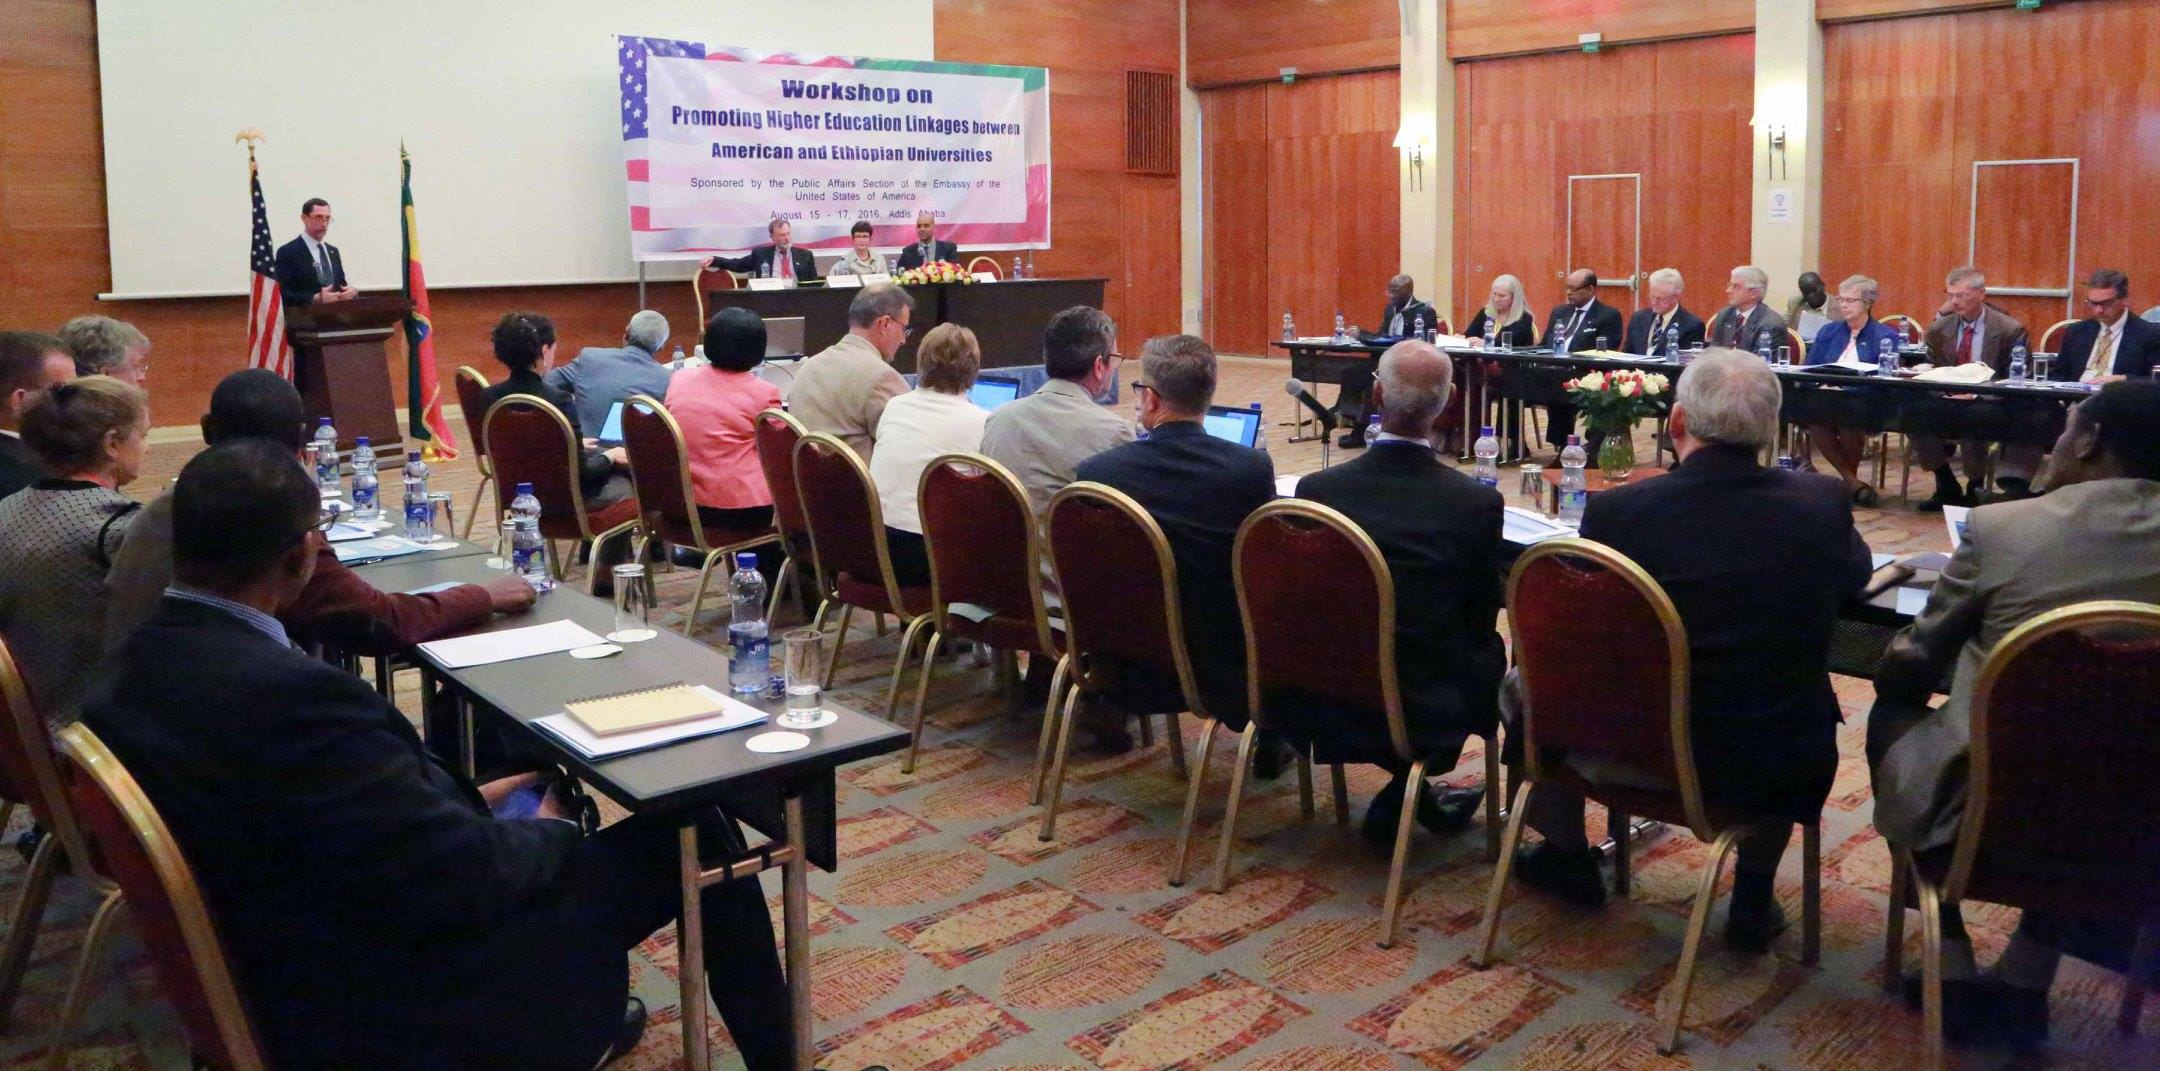 ethiopia USA Partnership1 Ethiopia, US Keen to Foster Multisector Partnerships